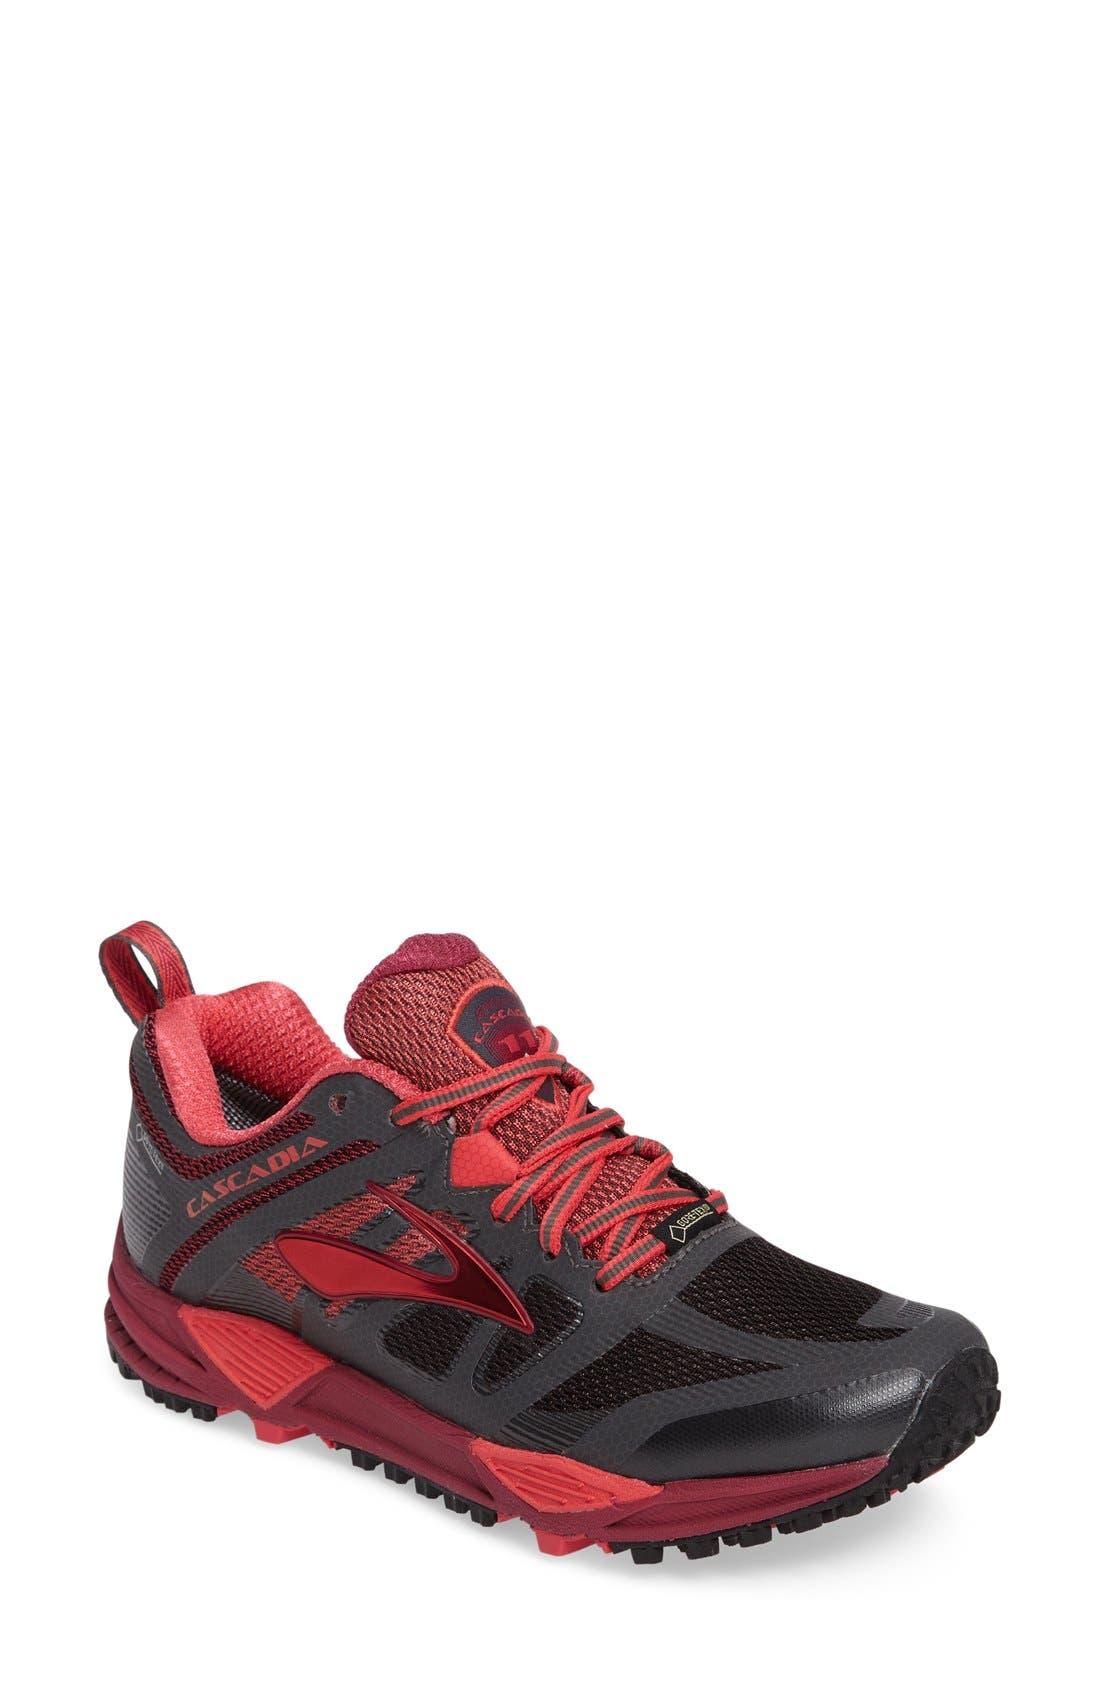 Main Image - Brooks Cascadia 11 GTX Trail Running Shoe (Women)